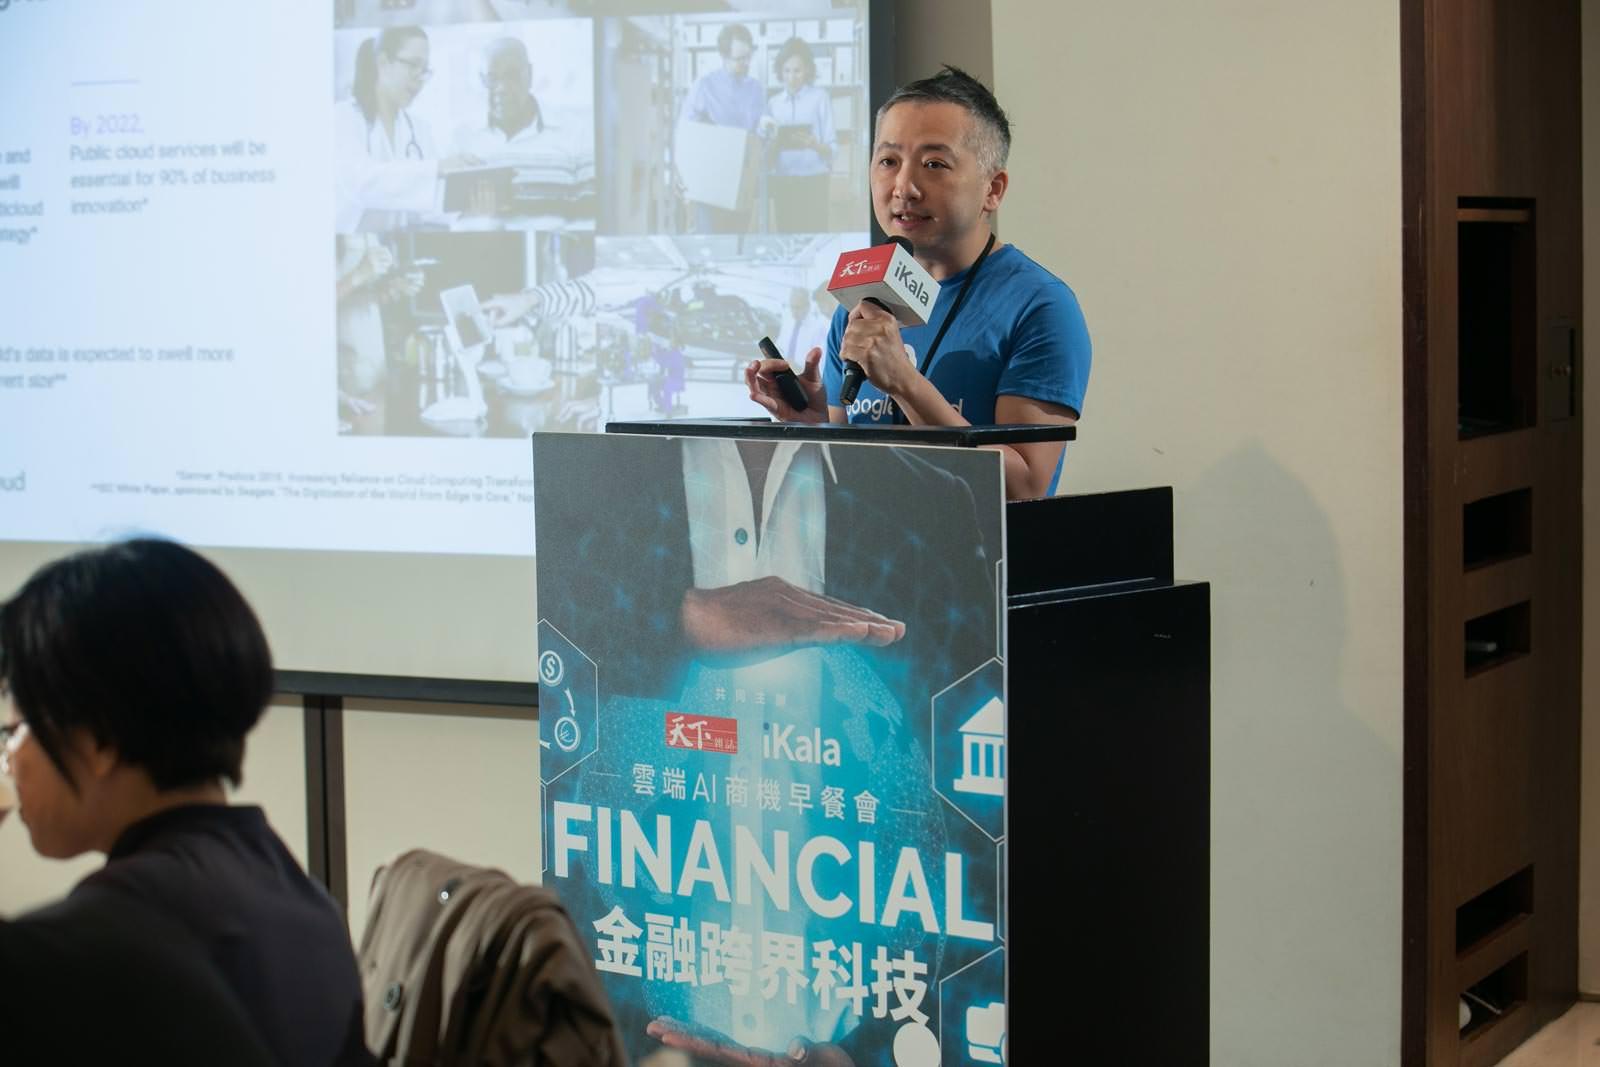 Google Cloud企業客戶經理田哲禹建議銀行業可以在創新路上站在巨人的肩膀。